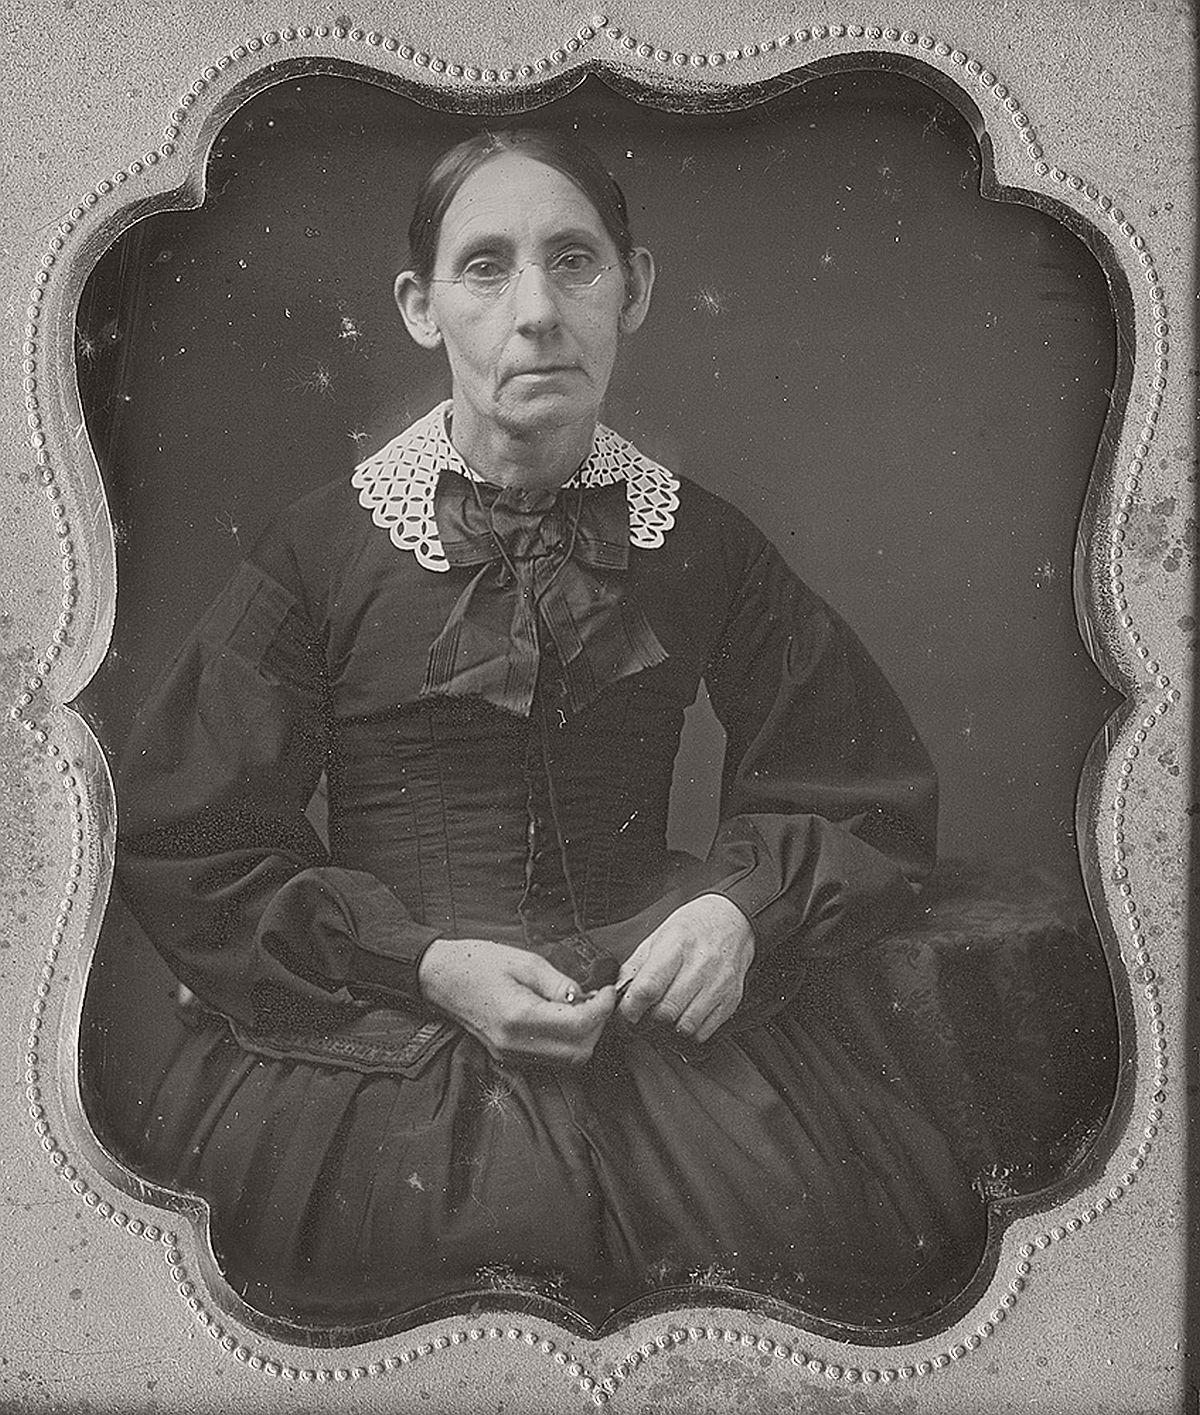 daguerreotype-portrait-ladies-born-in-the-late-18th-century-1700s-vintage-16